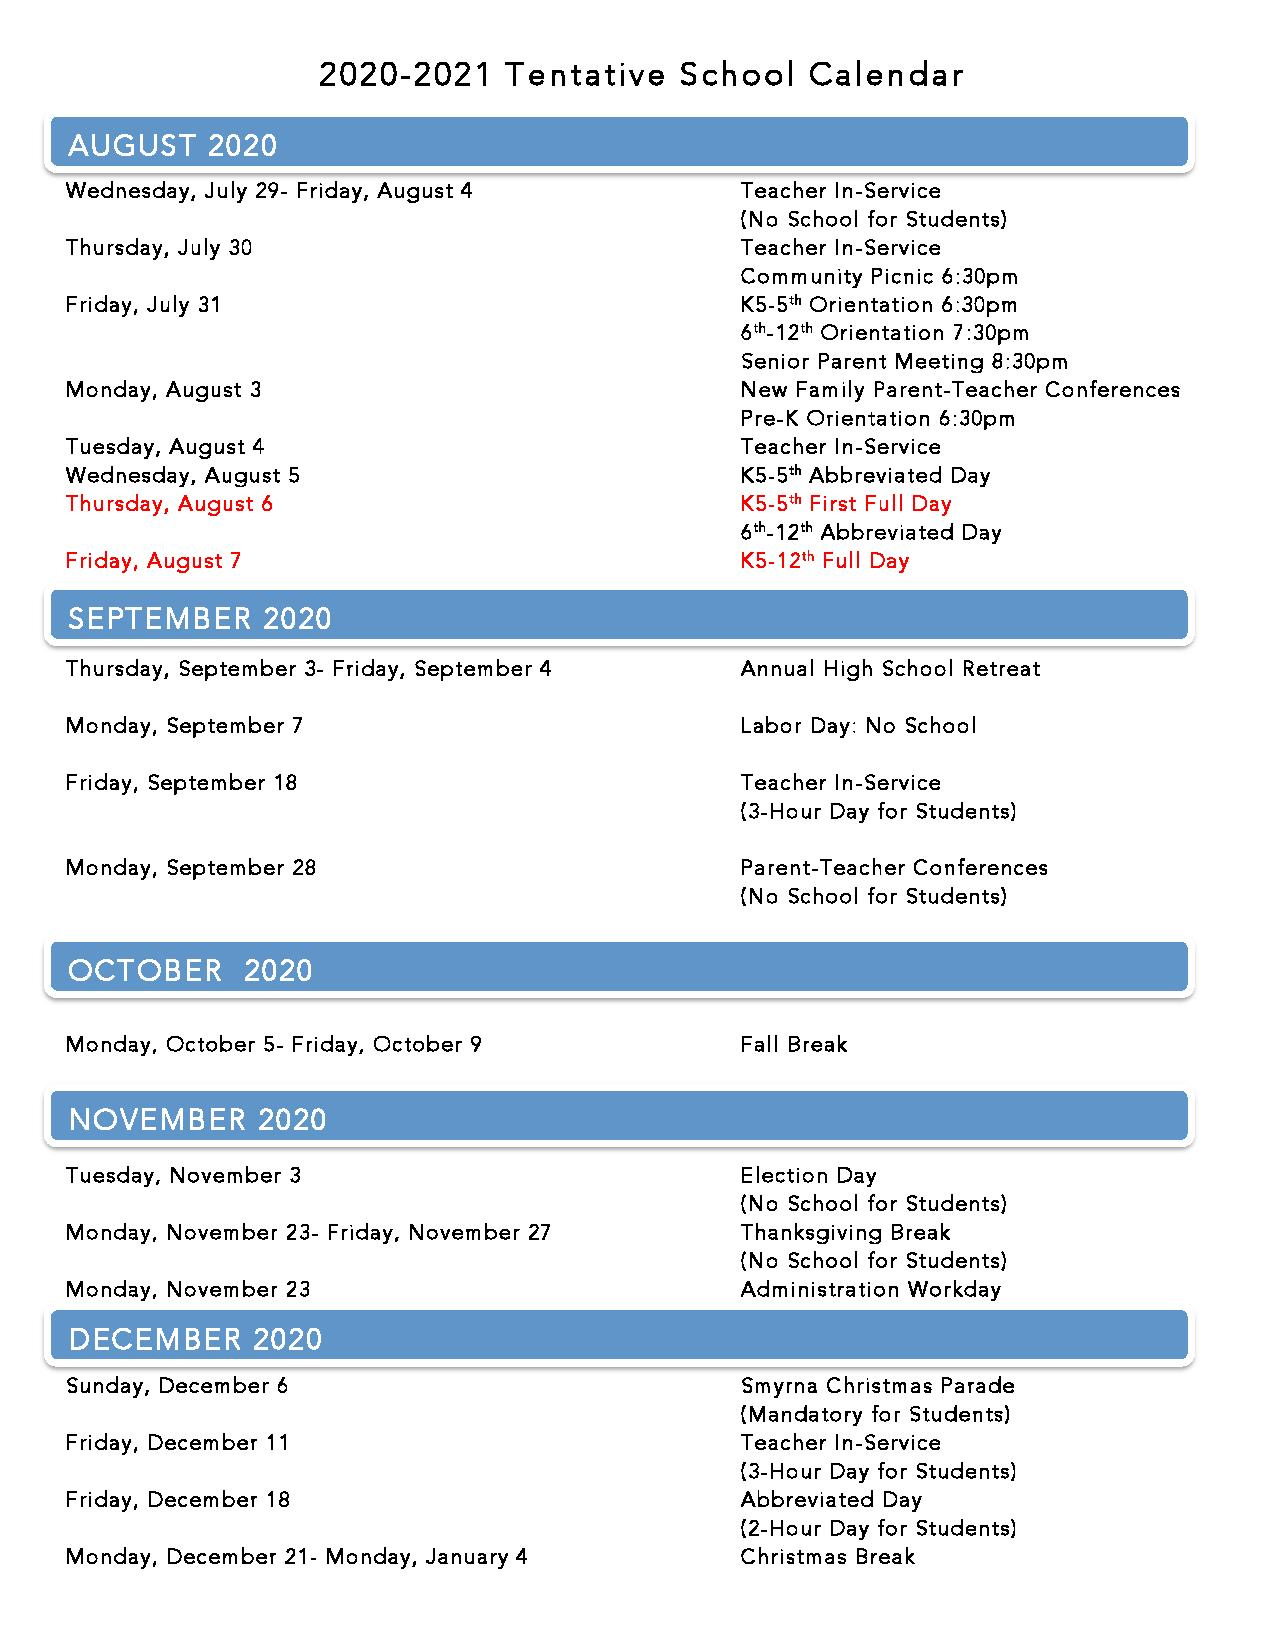 Davidson County Tn School Calendar 2021   Printable Within University Of Rhode Island 2021 Calendar